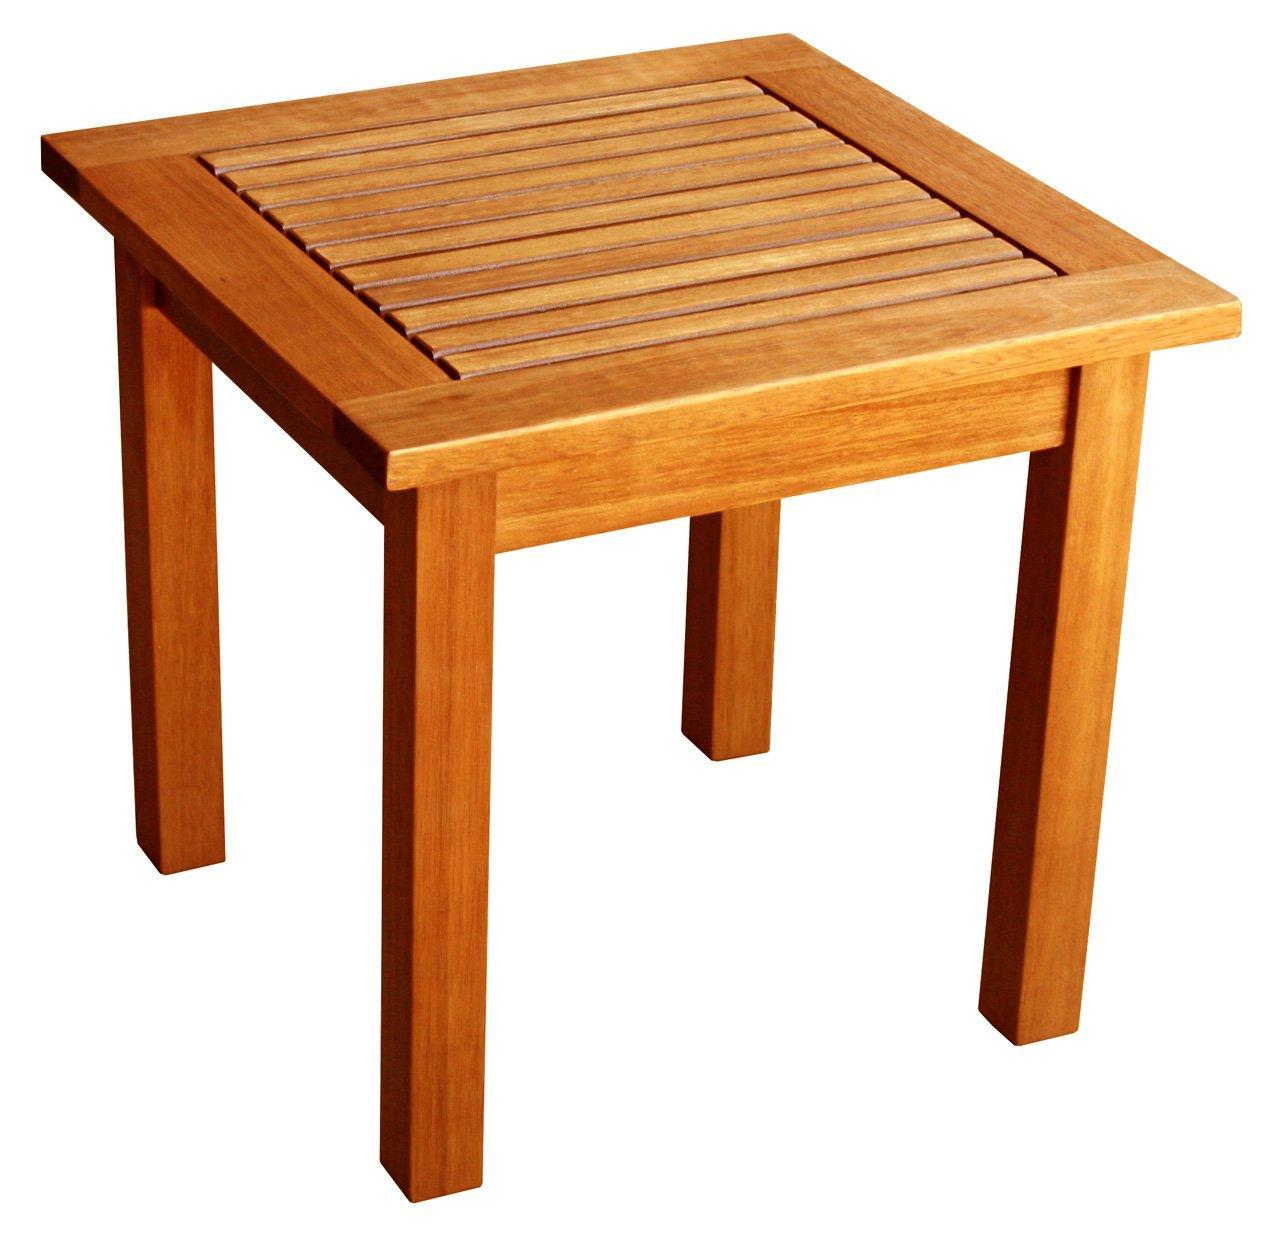 Çıtalı Kare Sehpa (Teak square coffee table) TN151 Bahçe ...